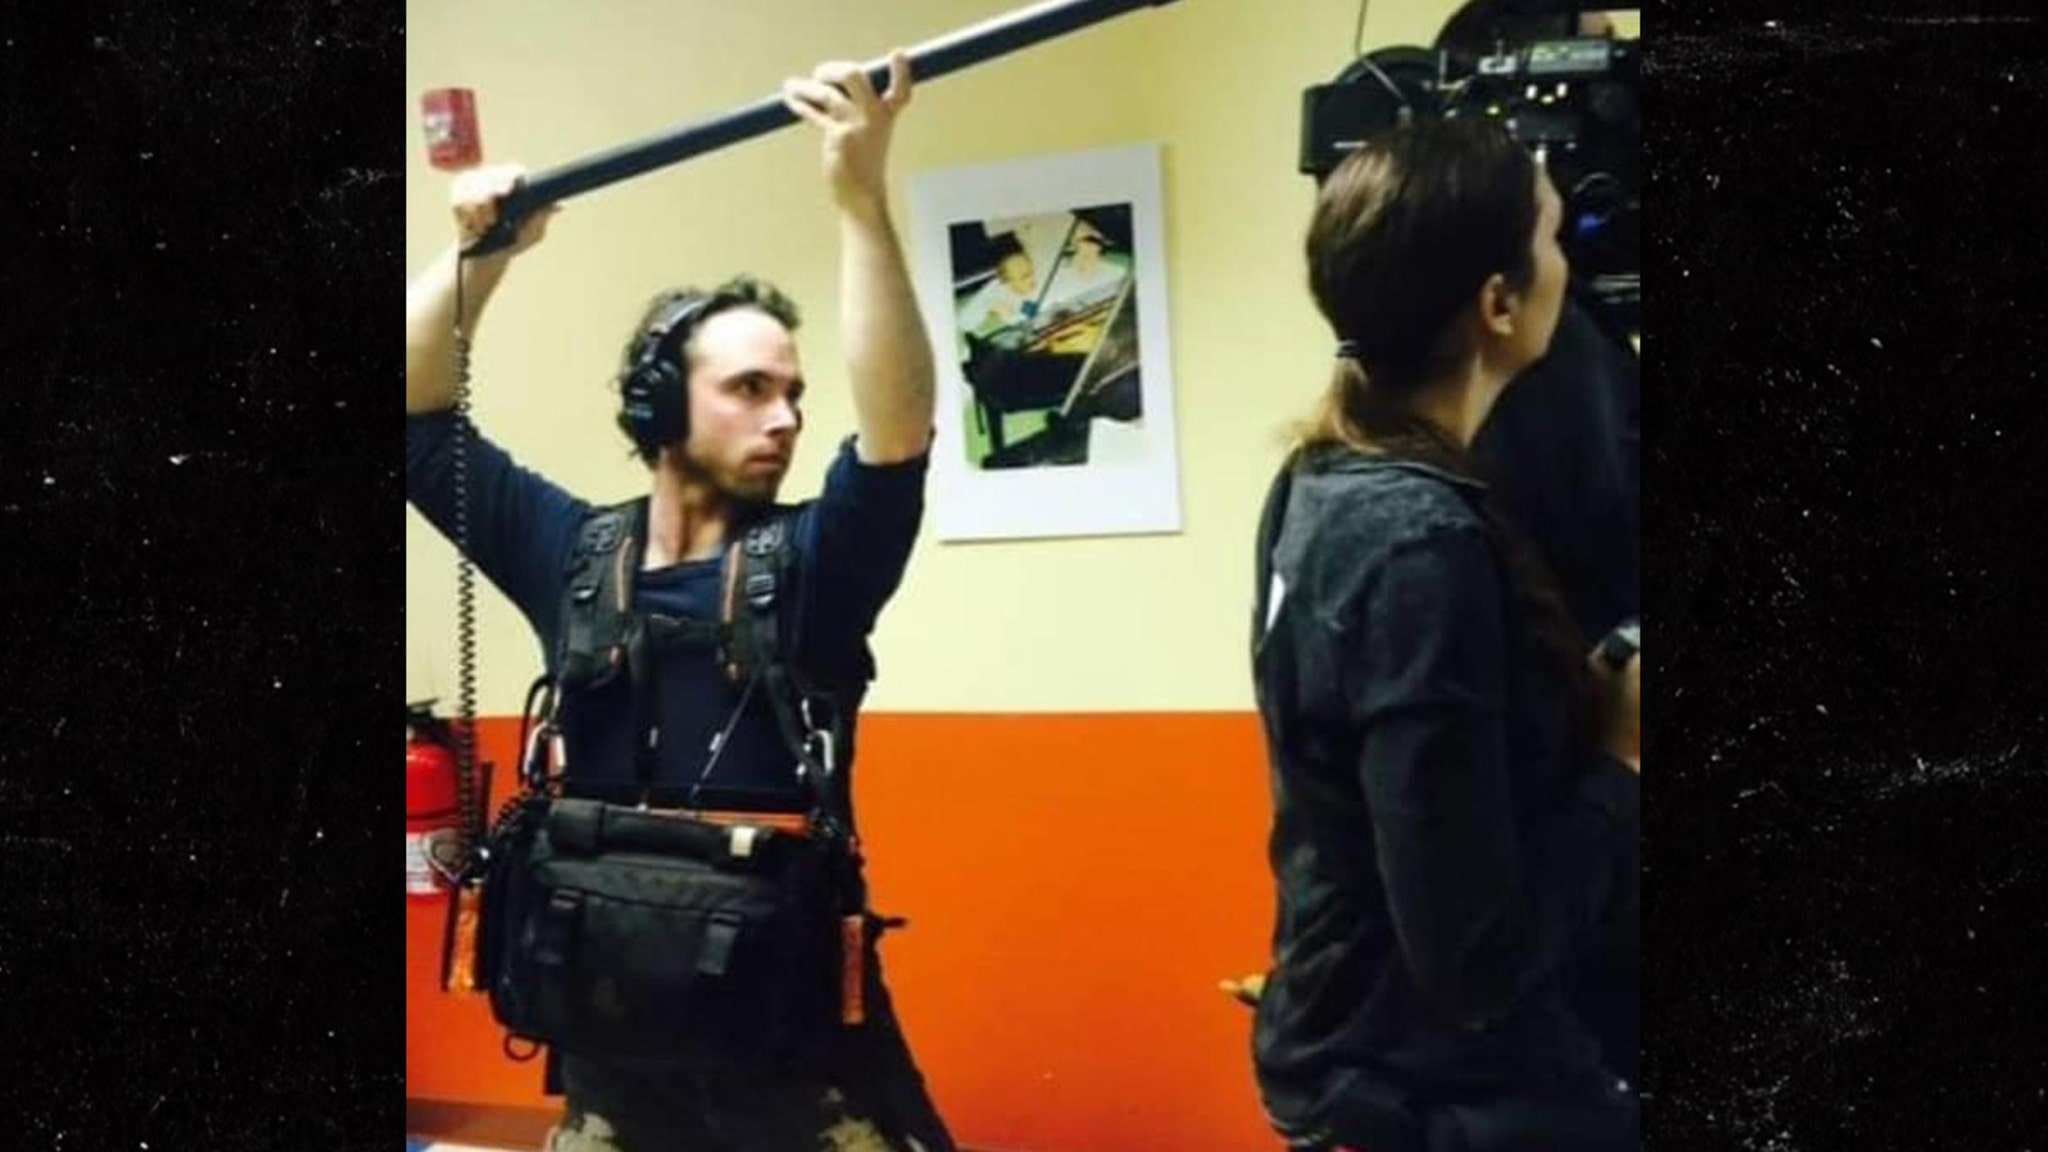 'Nomadland' Sound Mixer Michael Wolf Snyder Dies by Suicide at 35 - TMZ